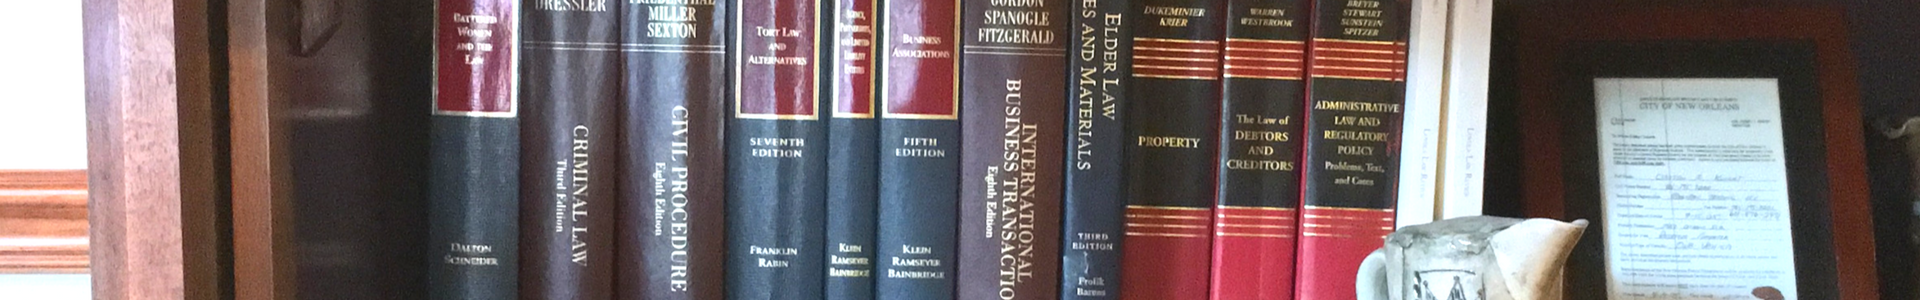 criminal civil code law books